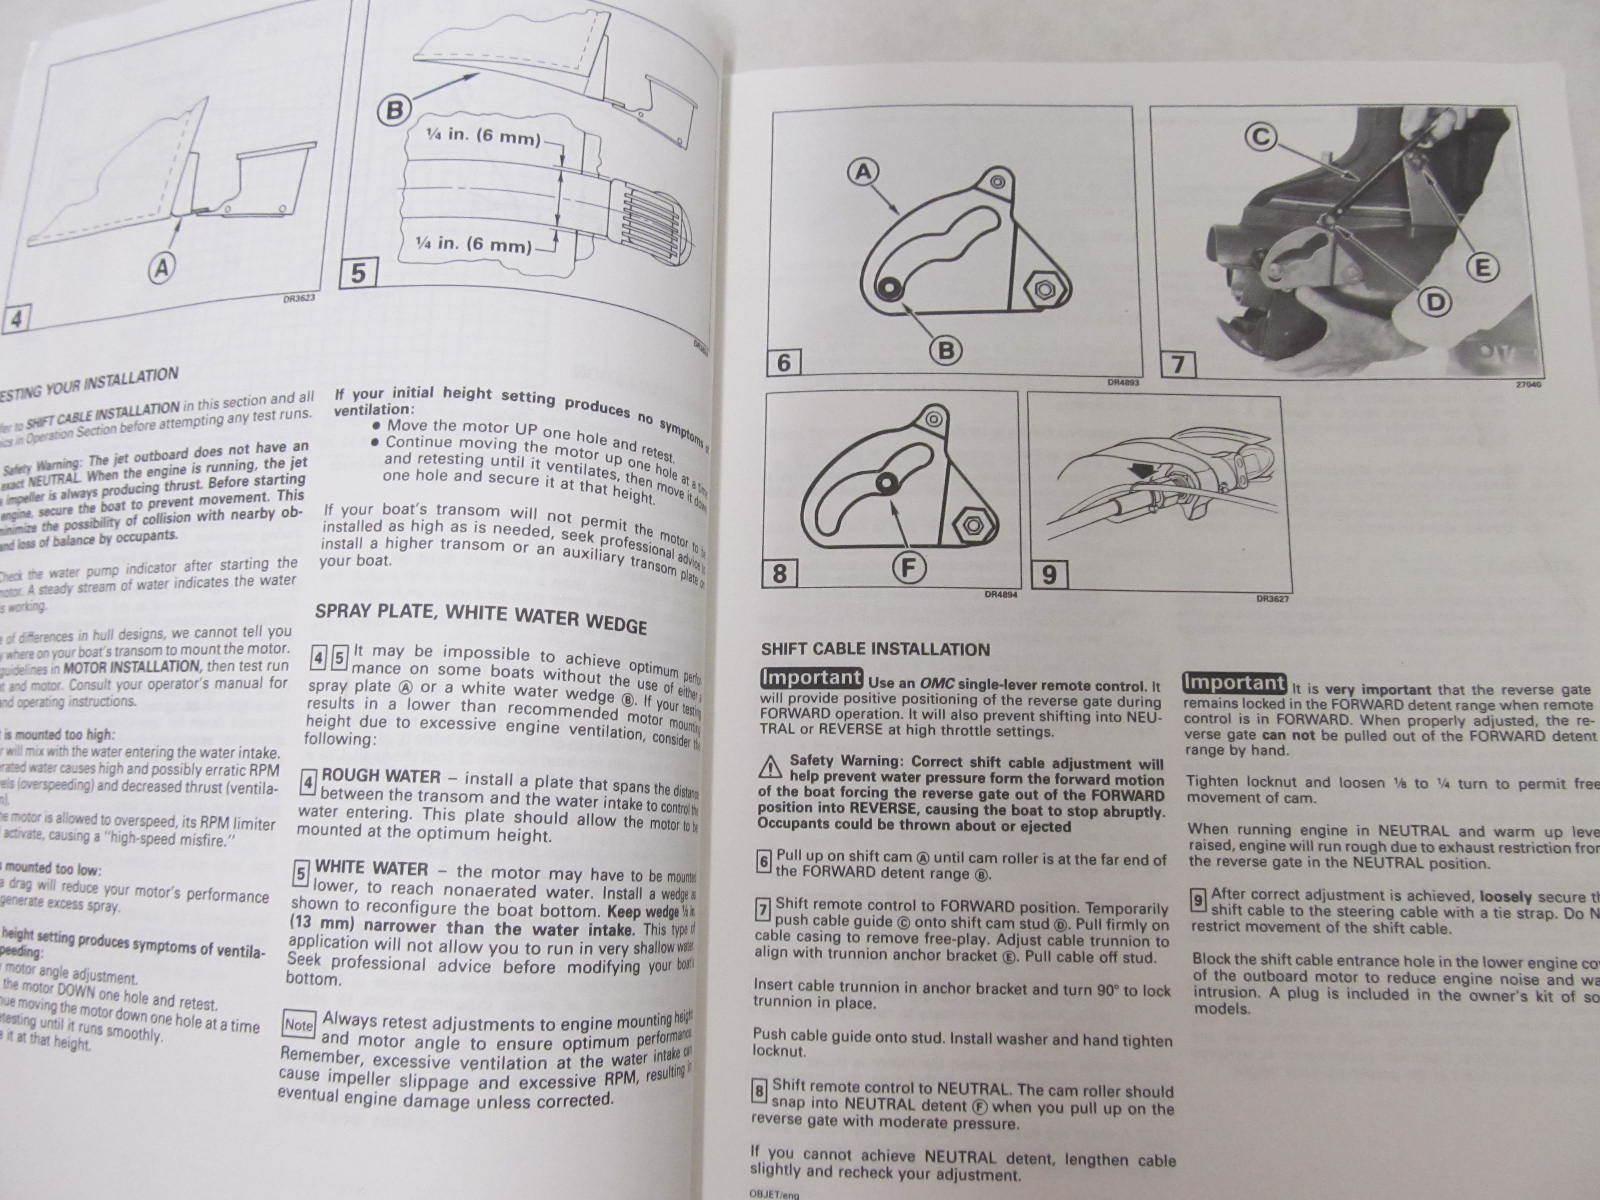 hight resolution of  array 212339 omc jet outboard operation u0026 maintenance manual supplement rh greenbayprop com